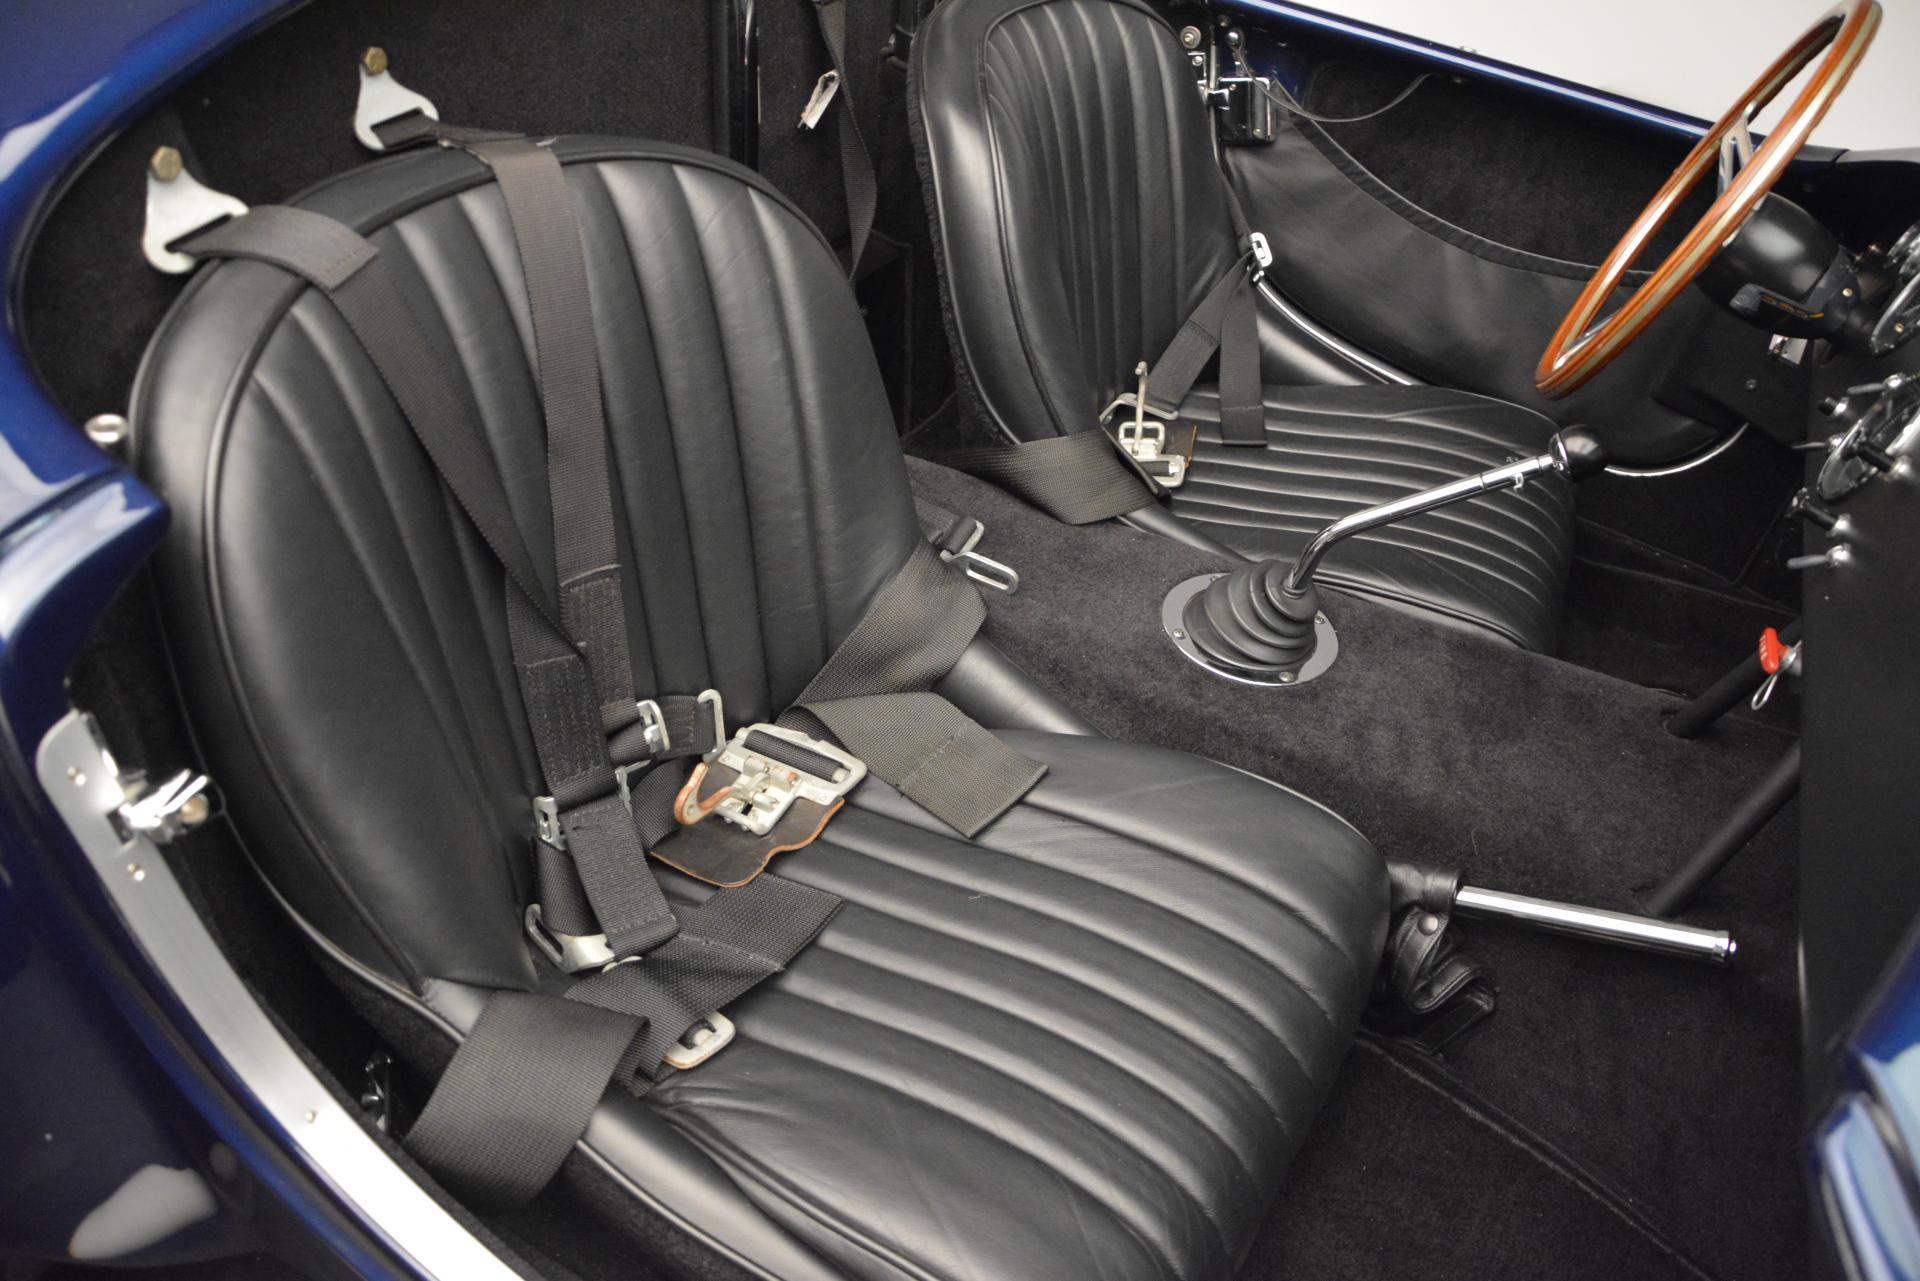 Used 2006 Ford ERA 427 SC  For Sale In Greenwich, CT. Alfa Romeo of Greenwich, 7051 107_p18